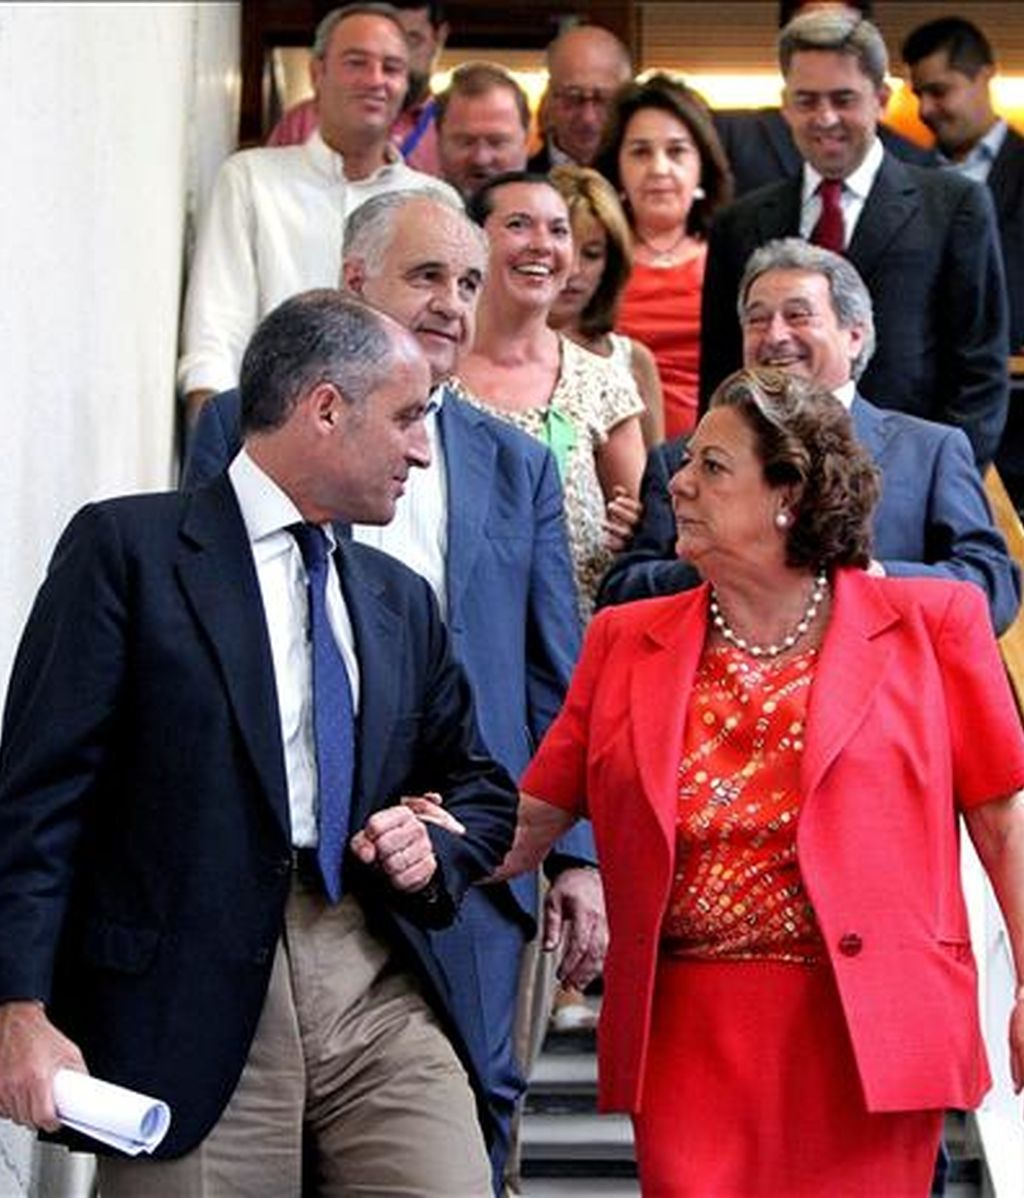 El president de la Generalitat, Francisco Camps, conversa con la alcaldesa de Valencia, Rita Barberá, a su llegada al Palau de la Música. EFE